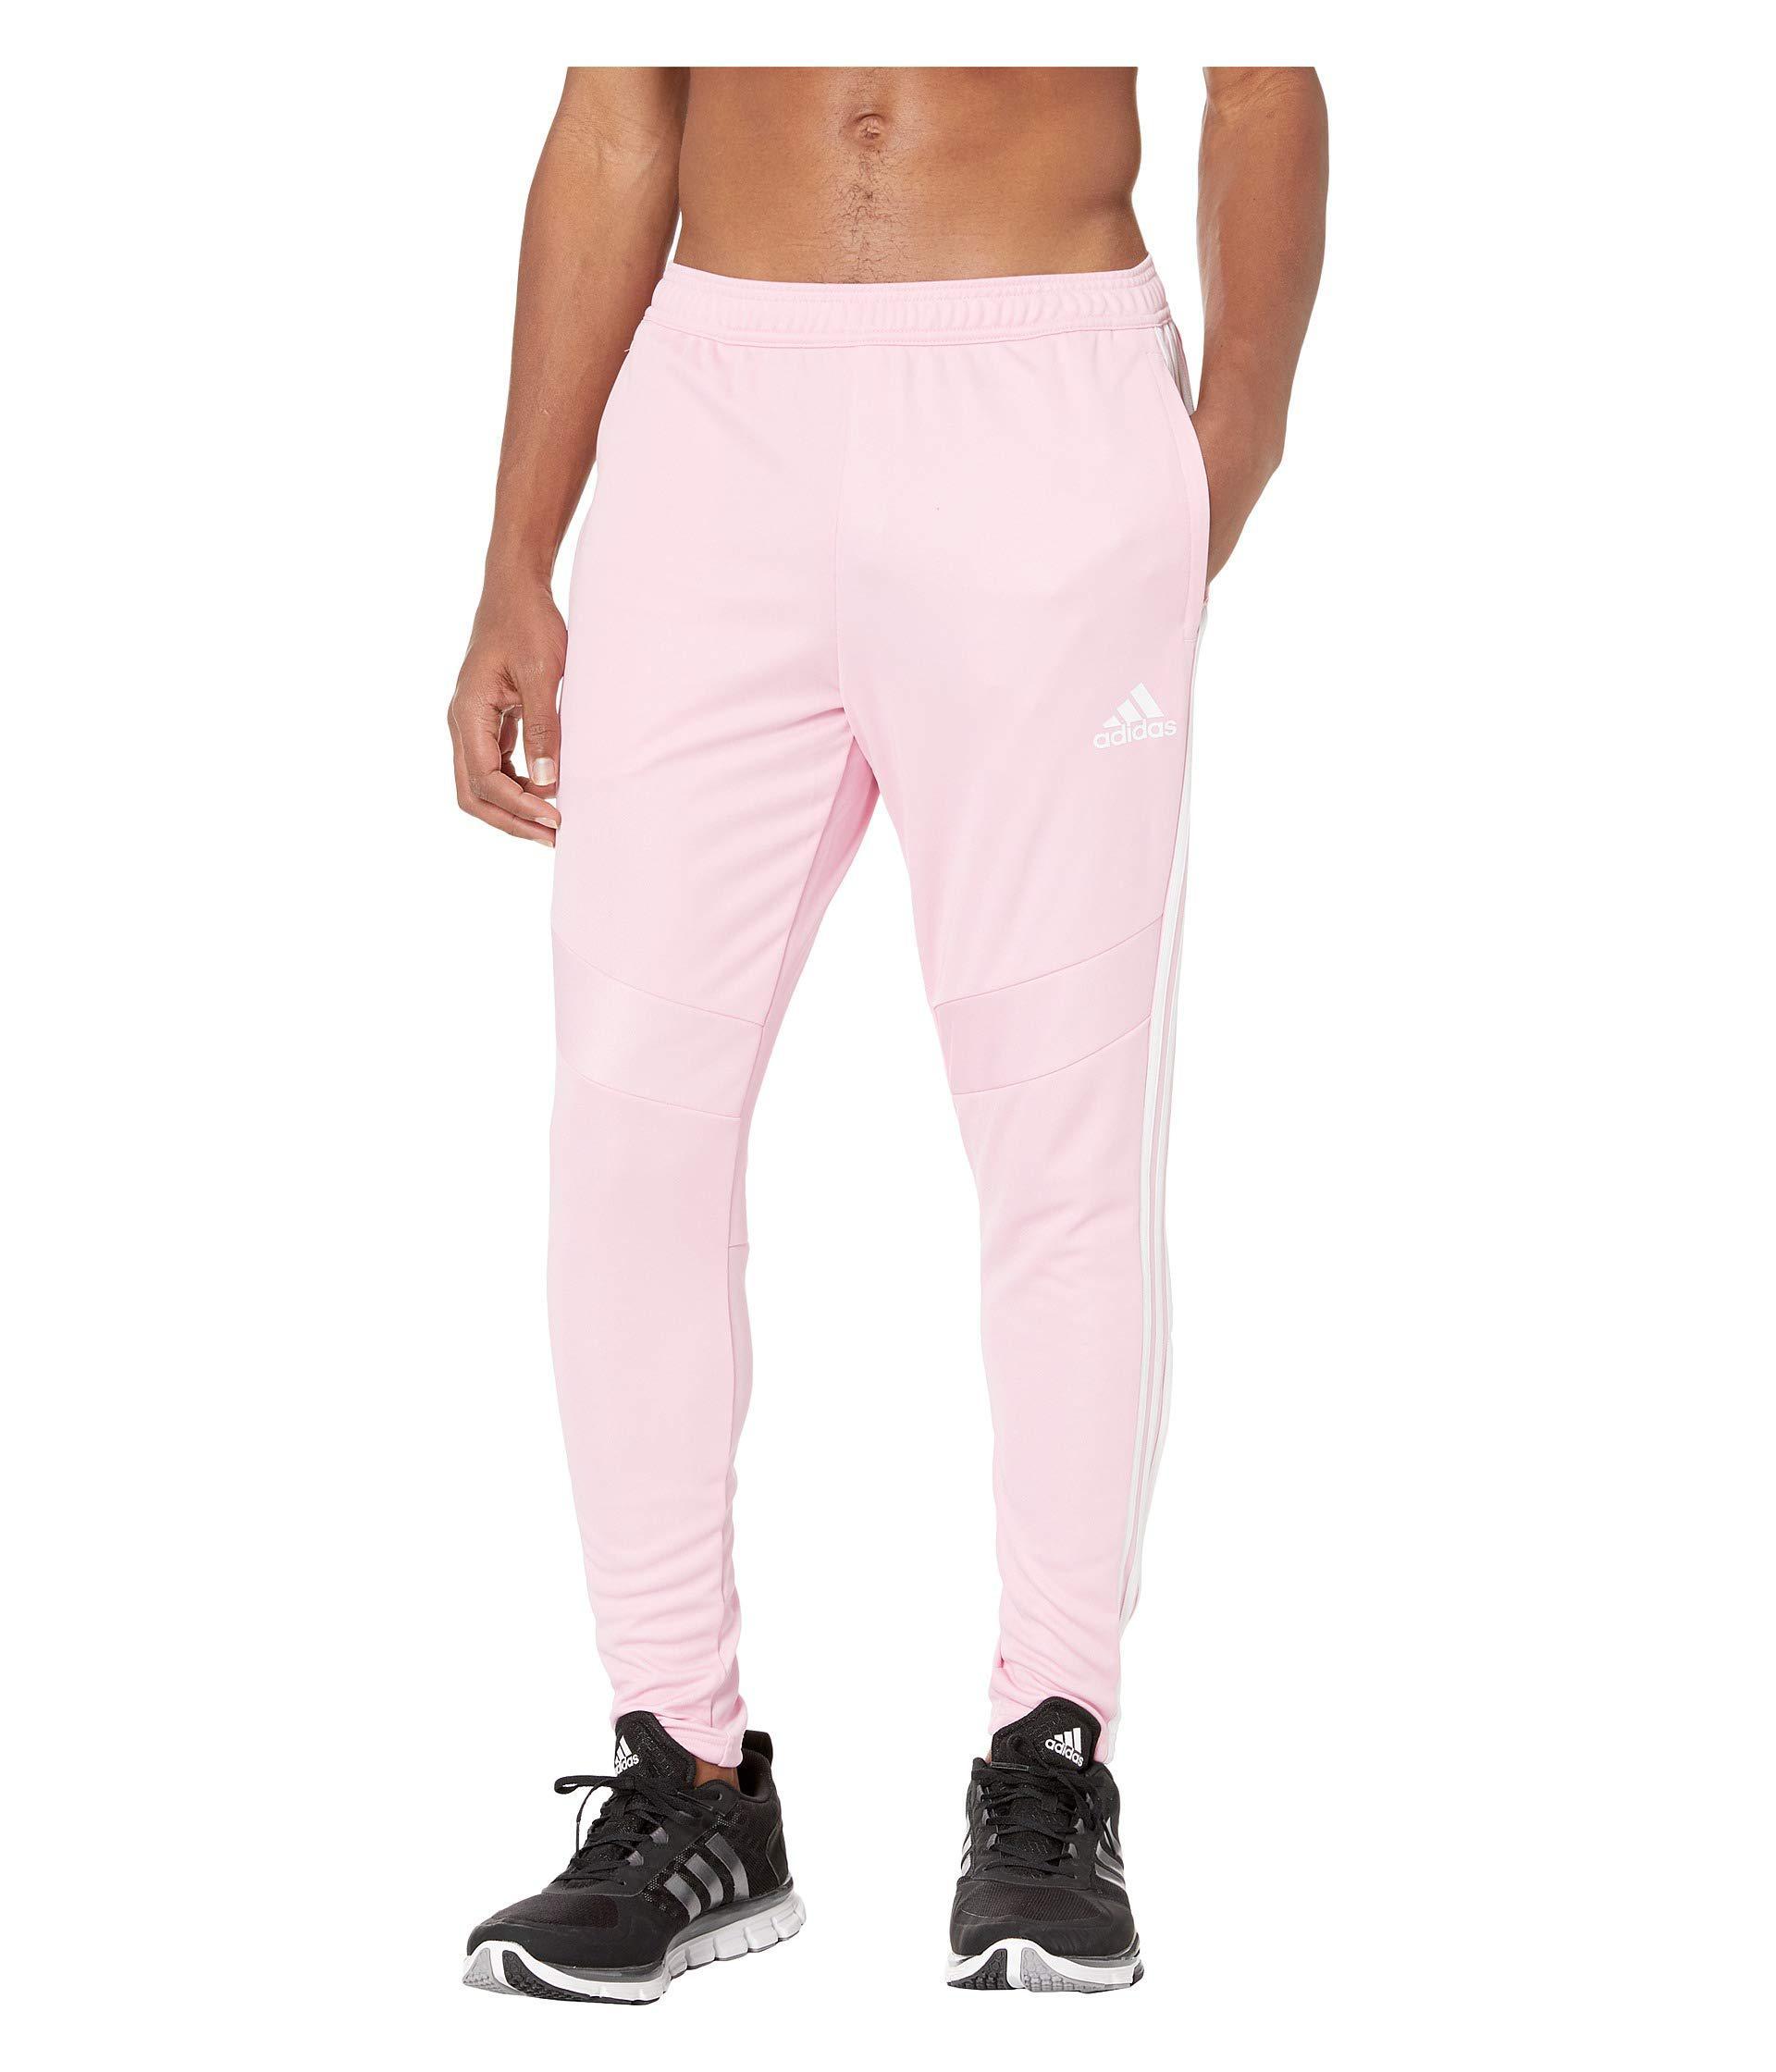 e2ab3791024 Lyst - adidas Tiro '19 Pants (dark Blue white) Men's Workout in Pink ...